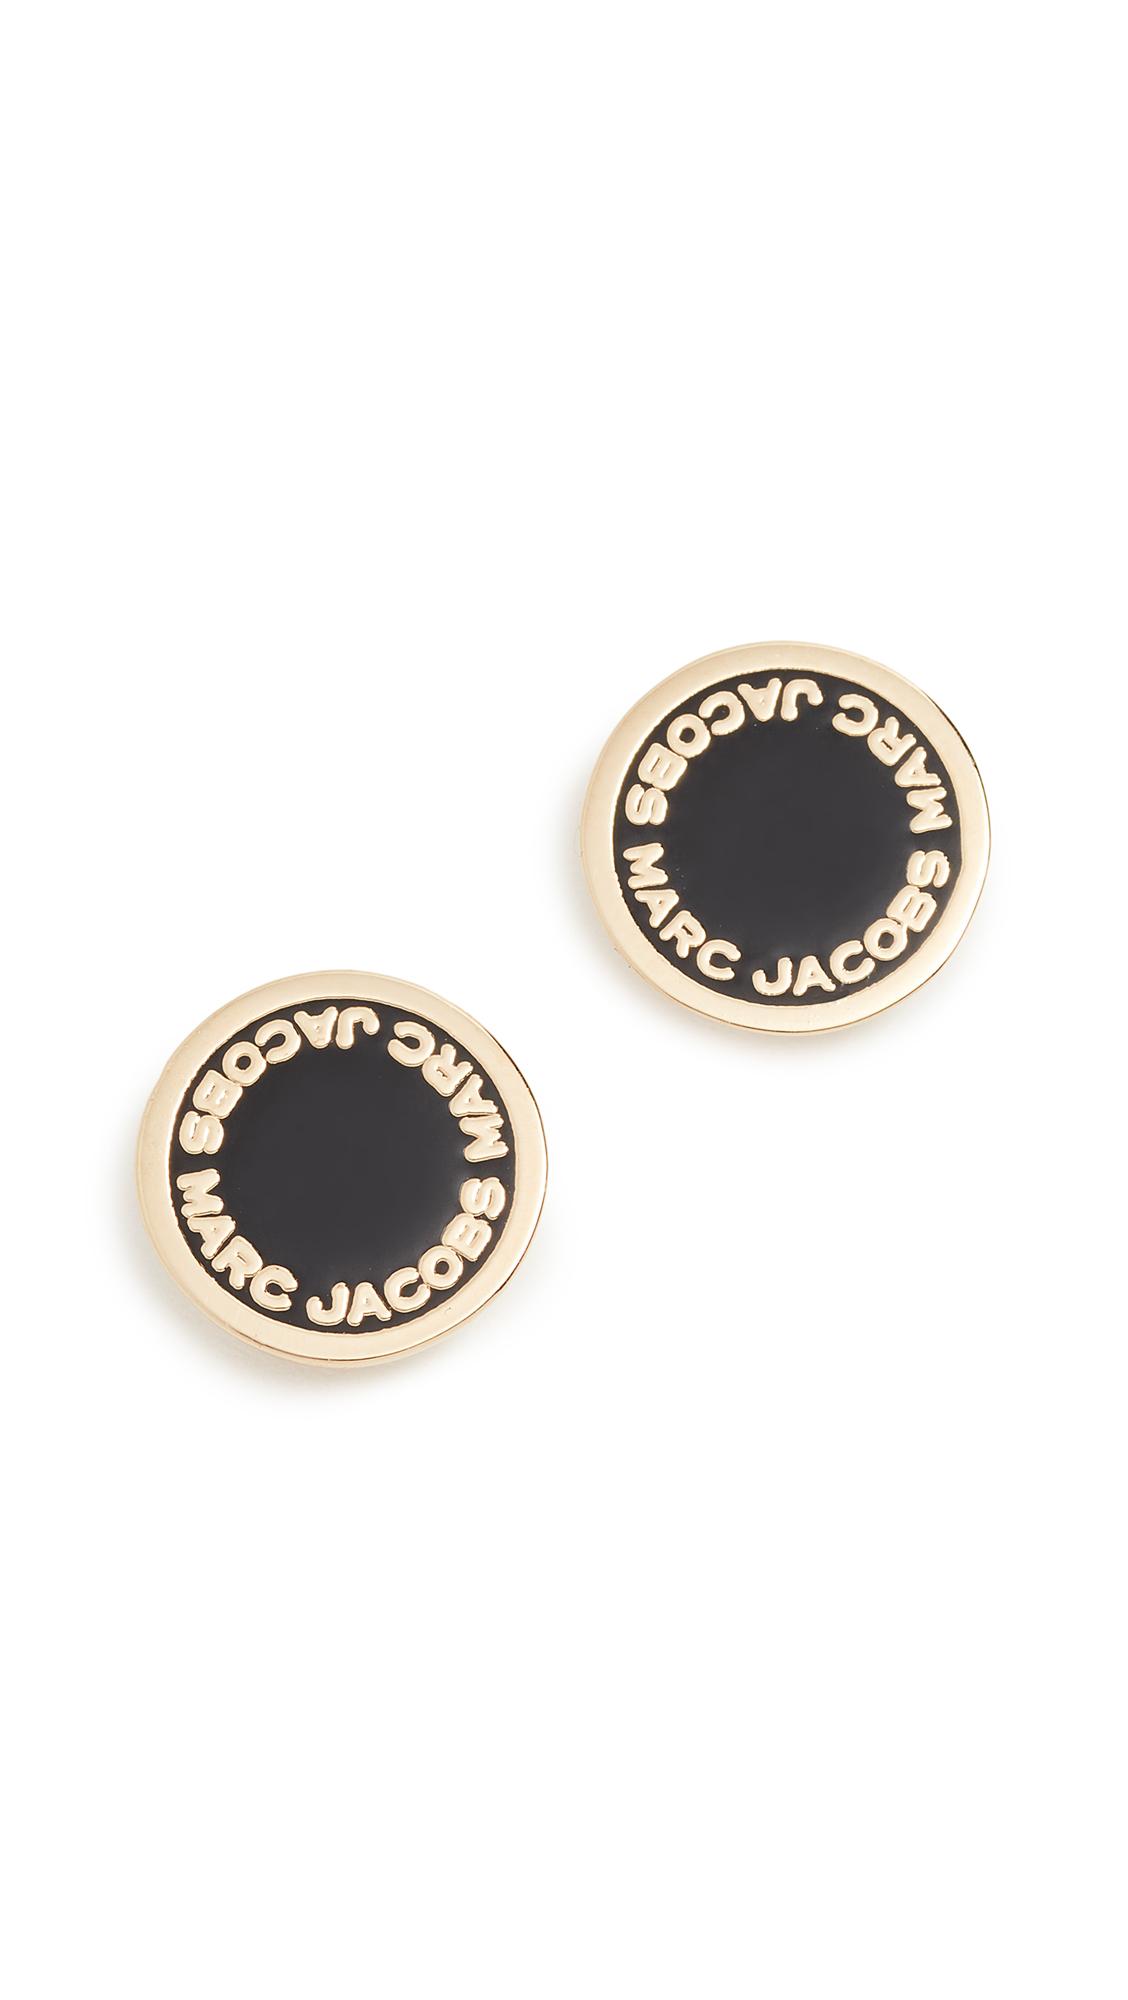 Marc Jacobs Enamel Logo Disc Stud Earrings - Black/Oro